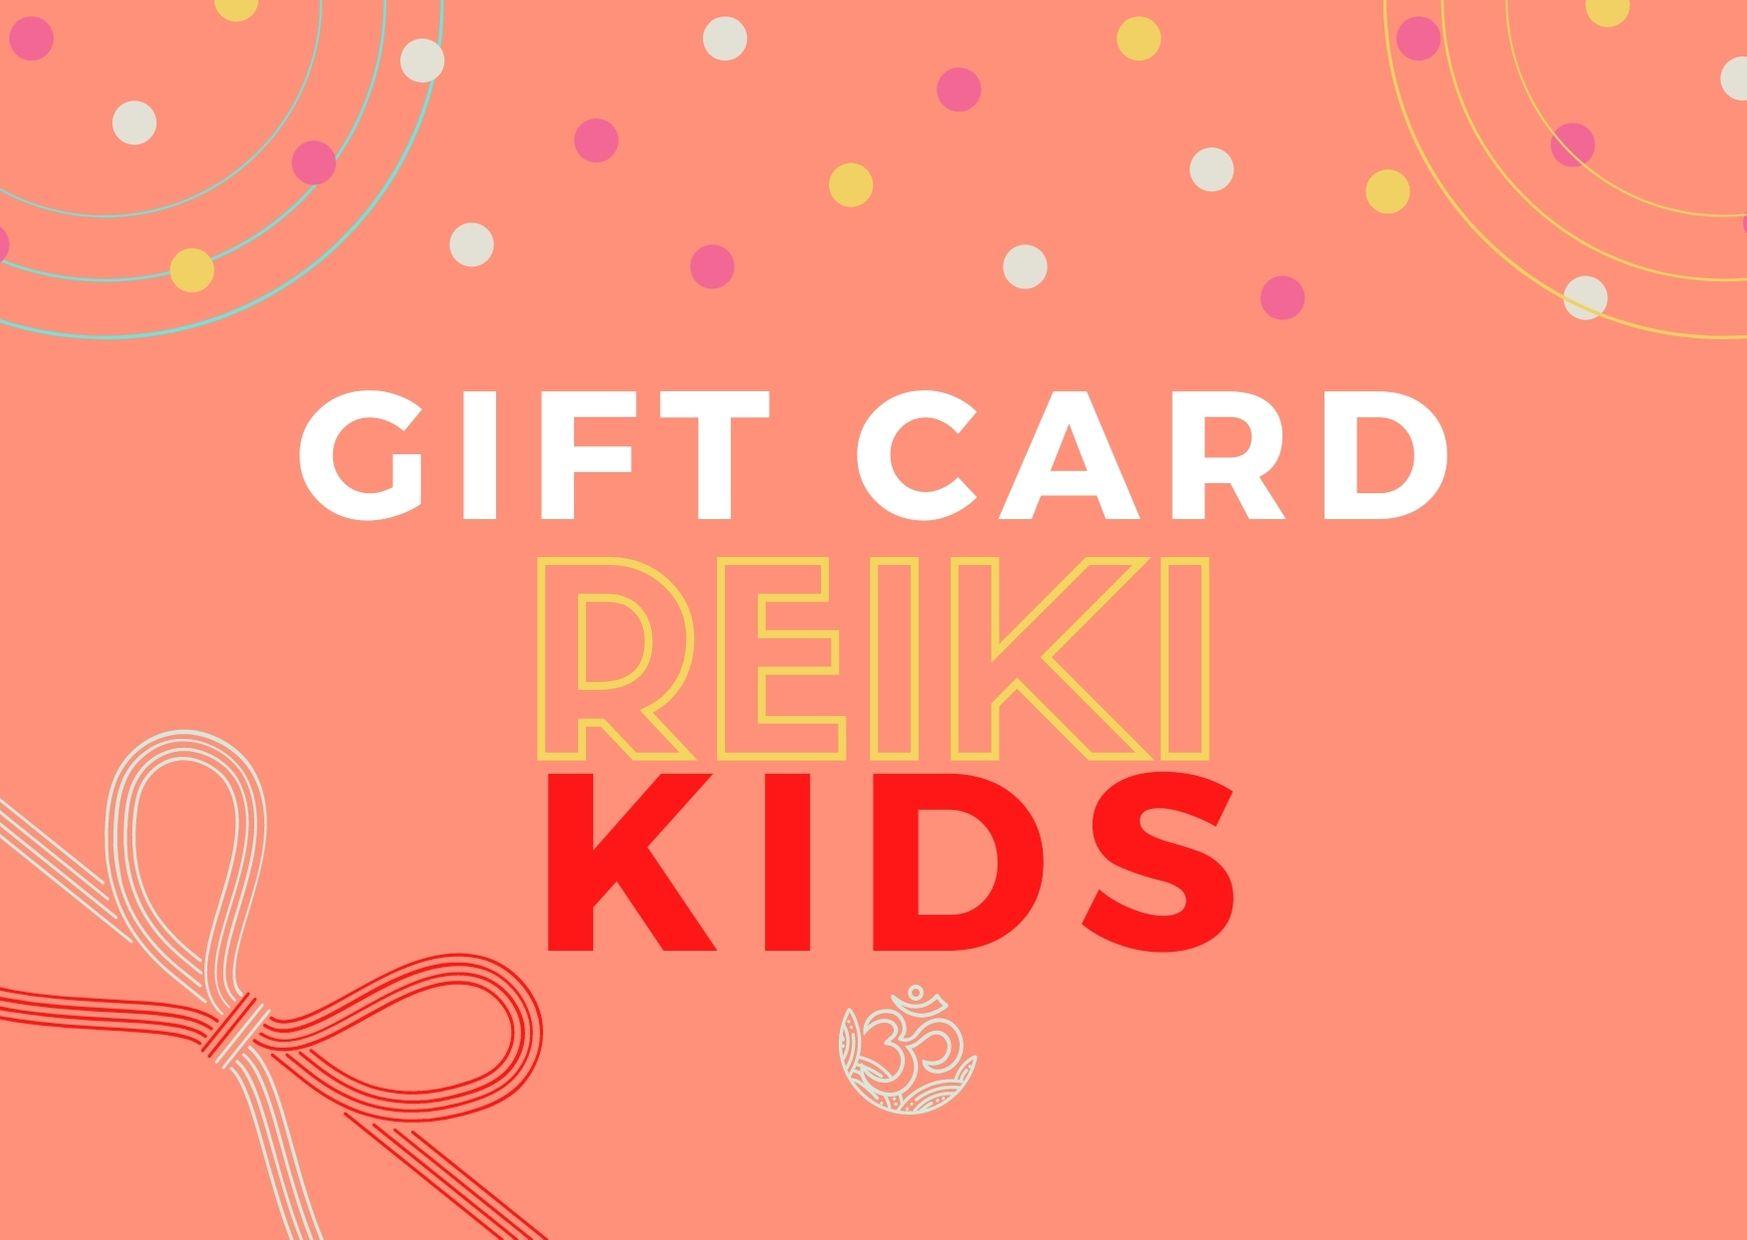 GIFT CARD - REIKI KIDS